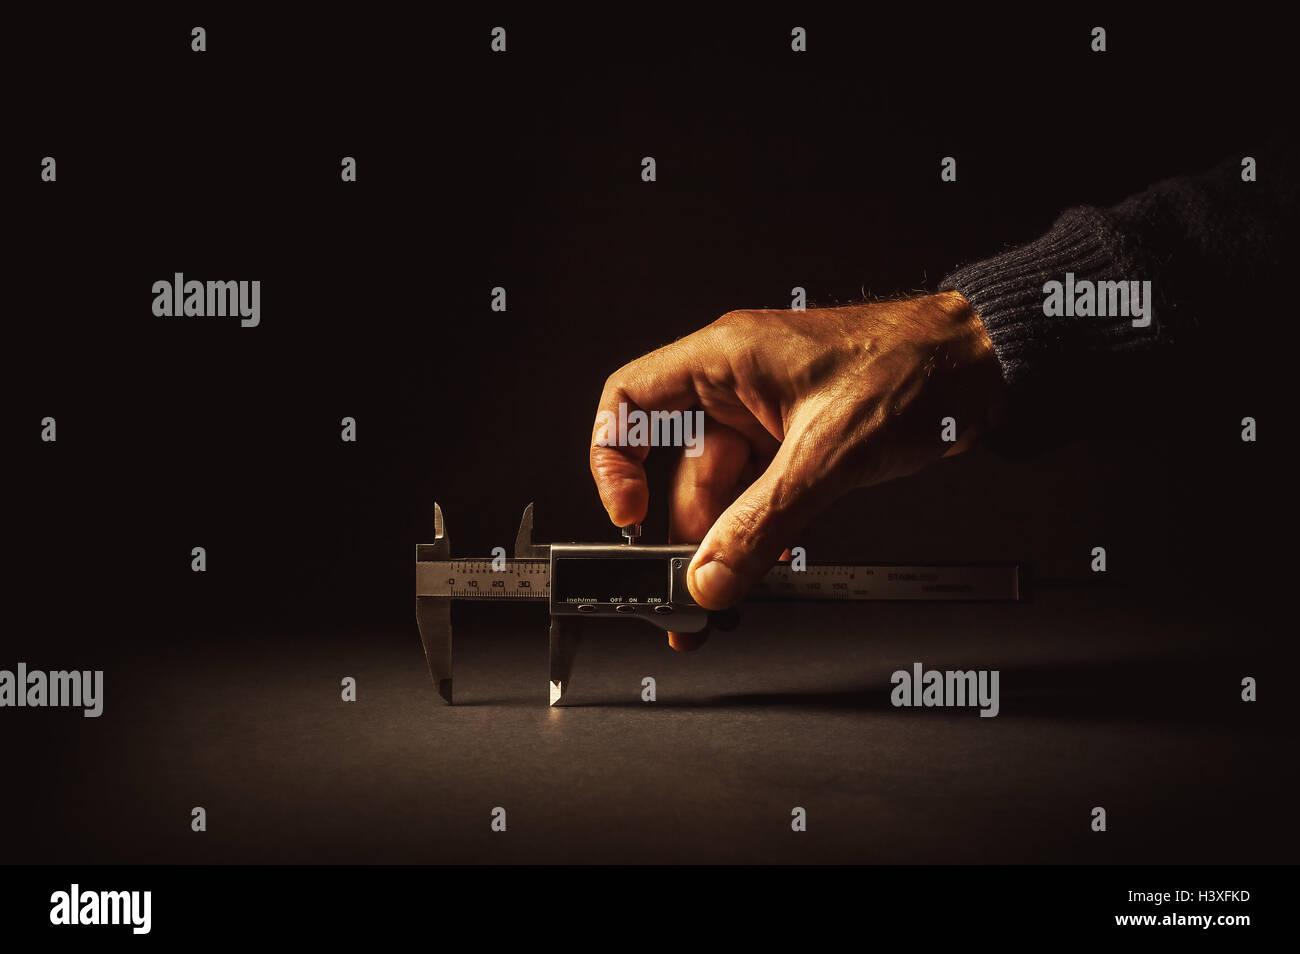 Measuring something with vernier caliper tool, on dark surface. - Stock Image